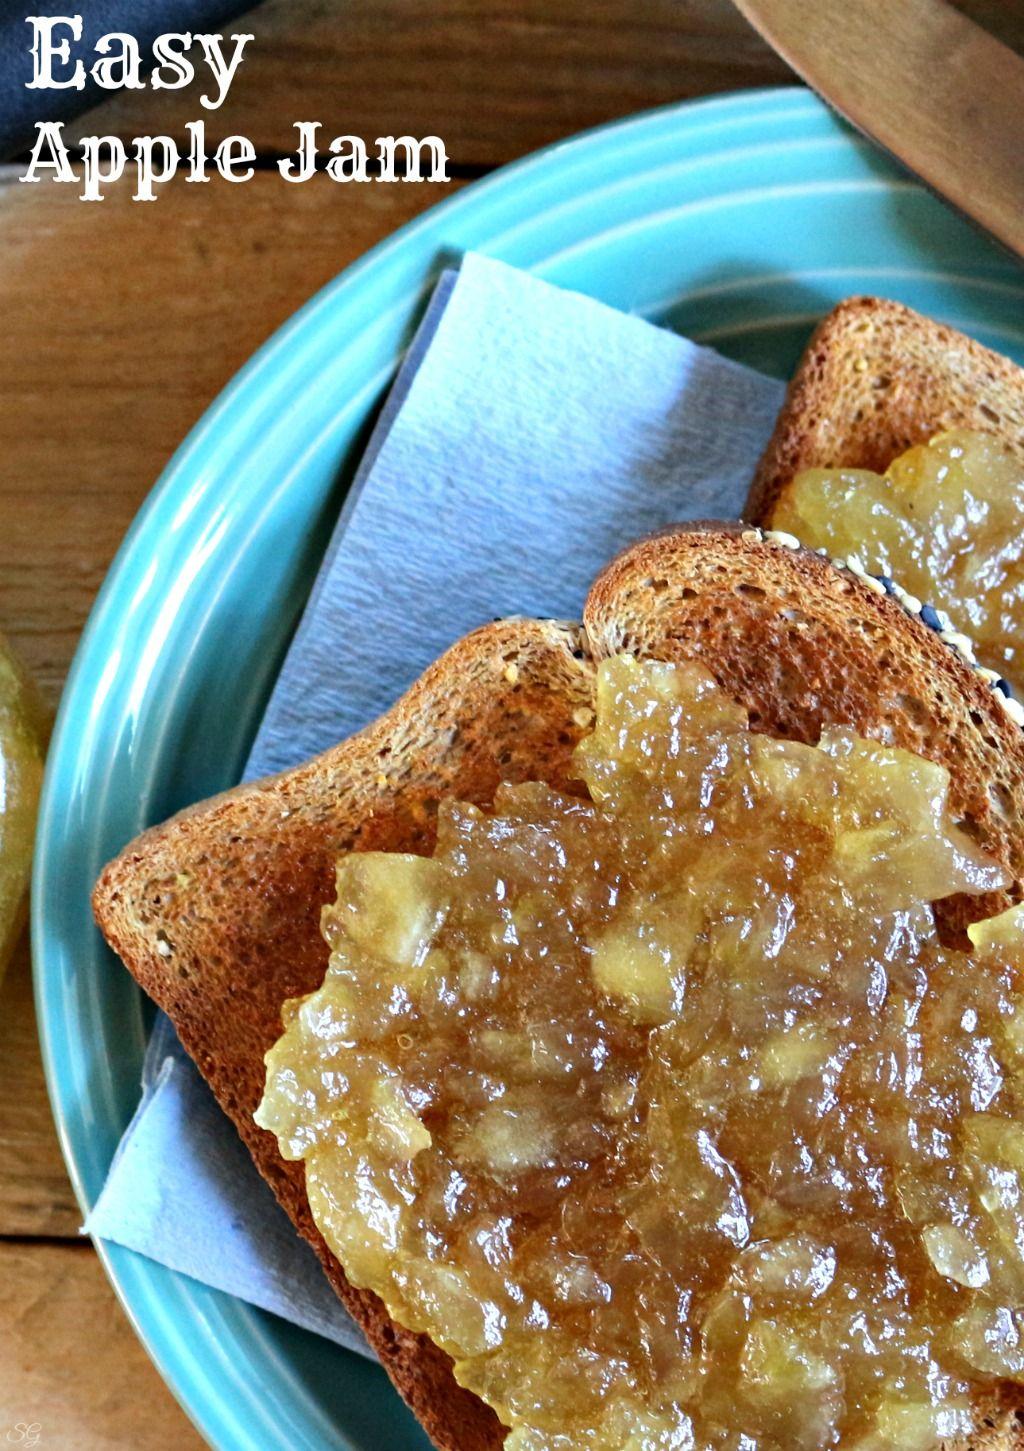 How to cook apple jam Simple recipe 95